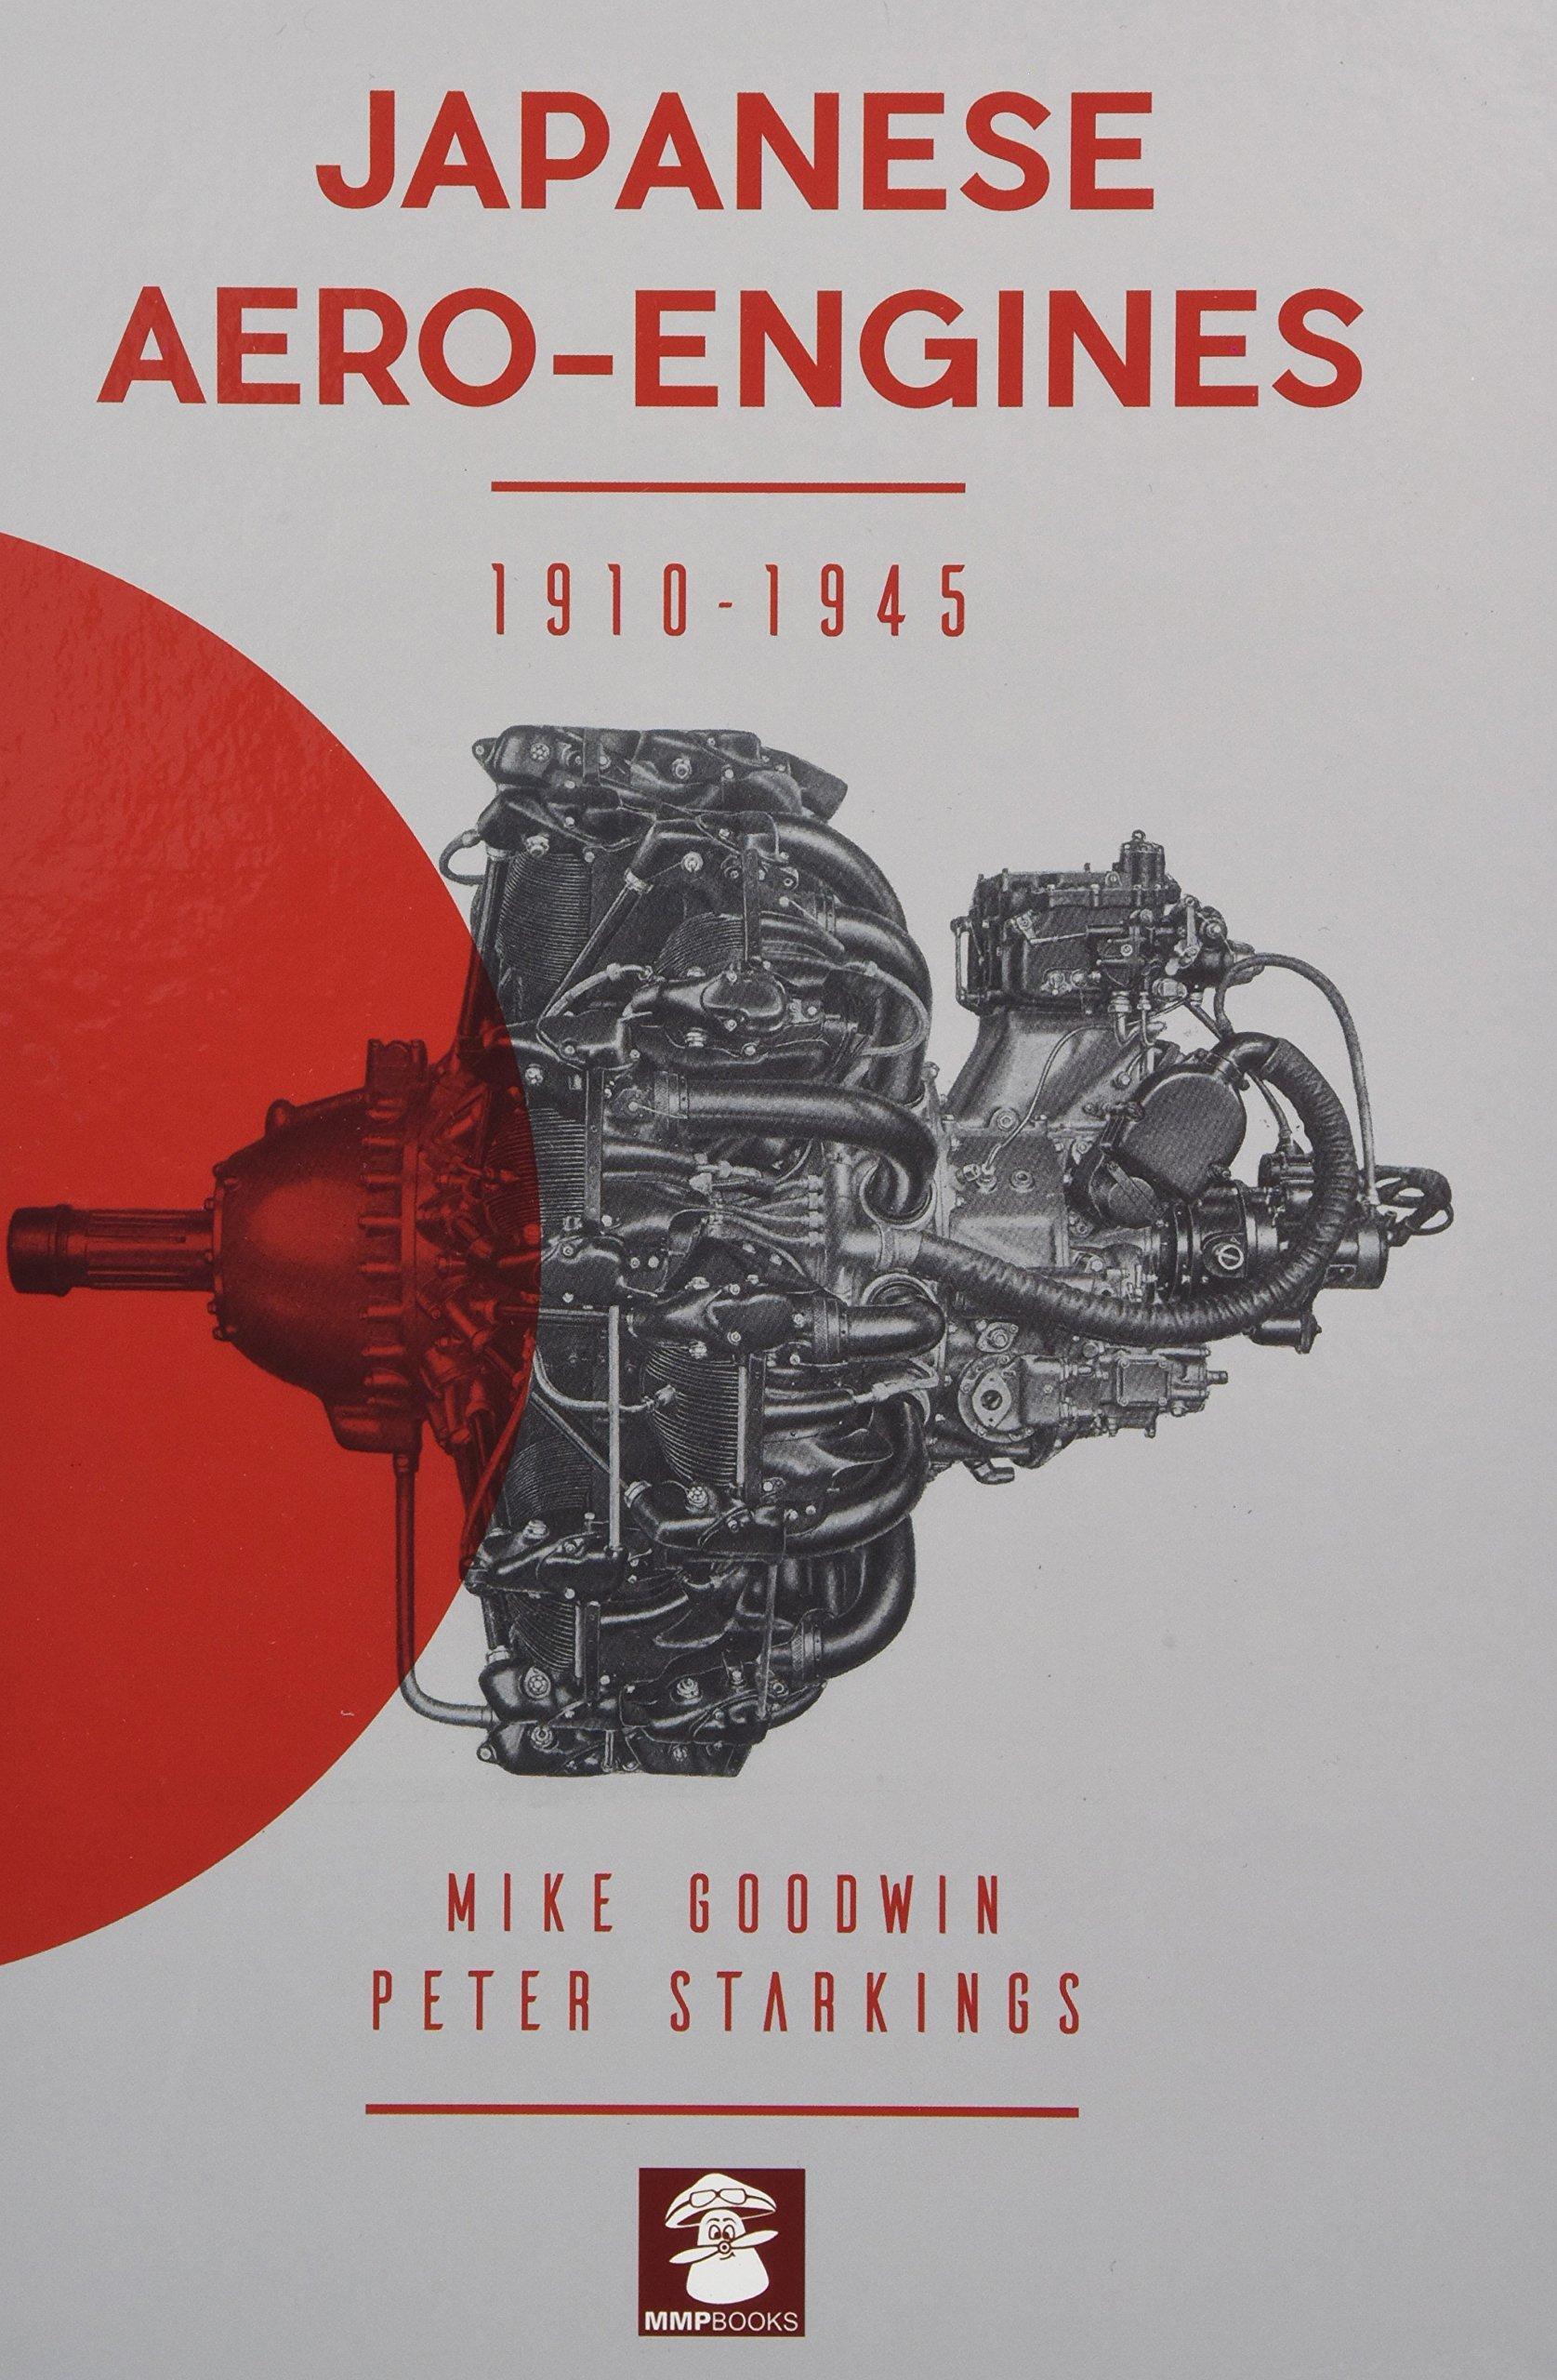 Japanese Aero-Engines 1910-1945: Mike Goodwin: 9788365281326